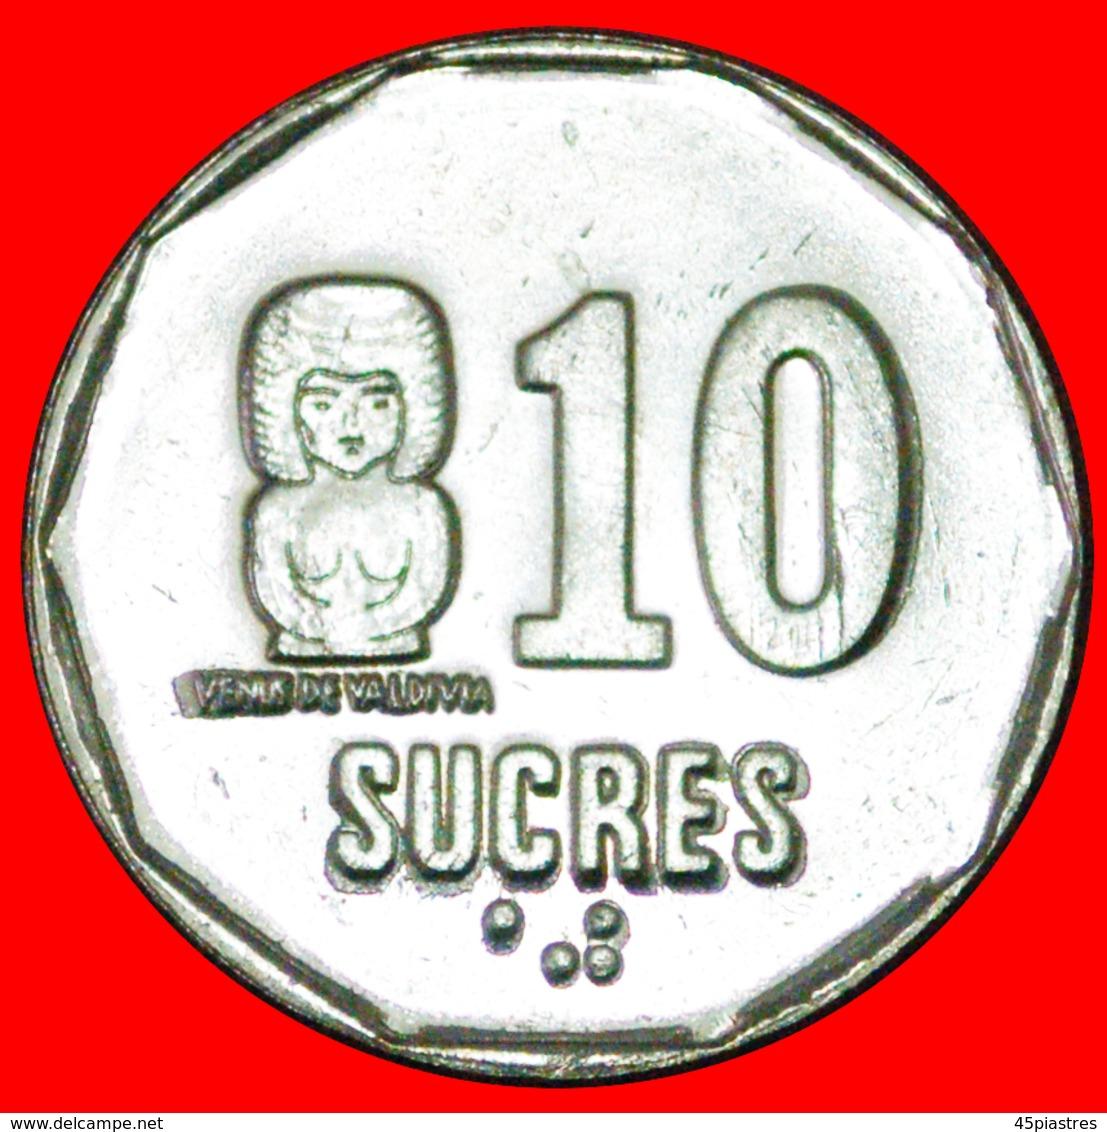 # CANADA: ECUADOR ★ 10 SUCRES 1991 MINT LUSTER! LOW START ★ NO RESERVE! - Ecuador